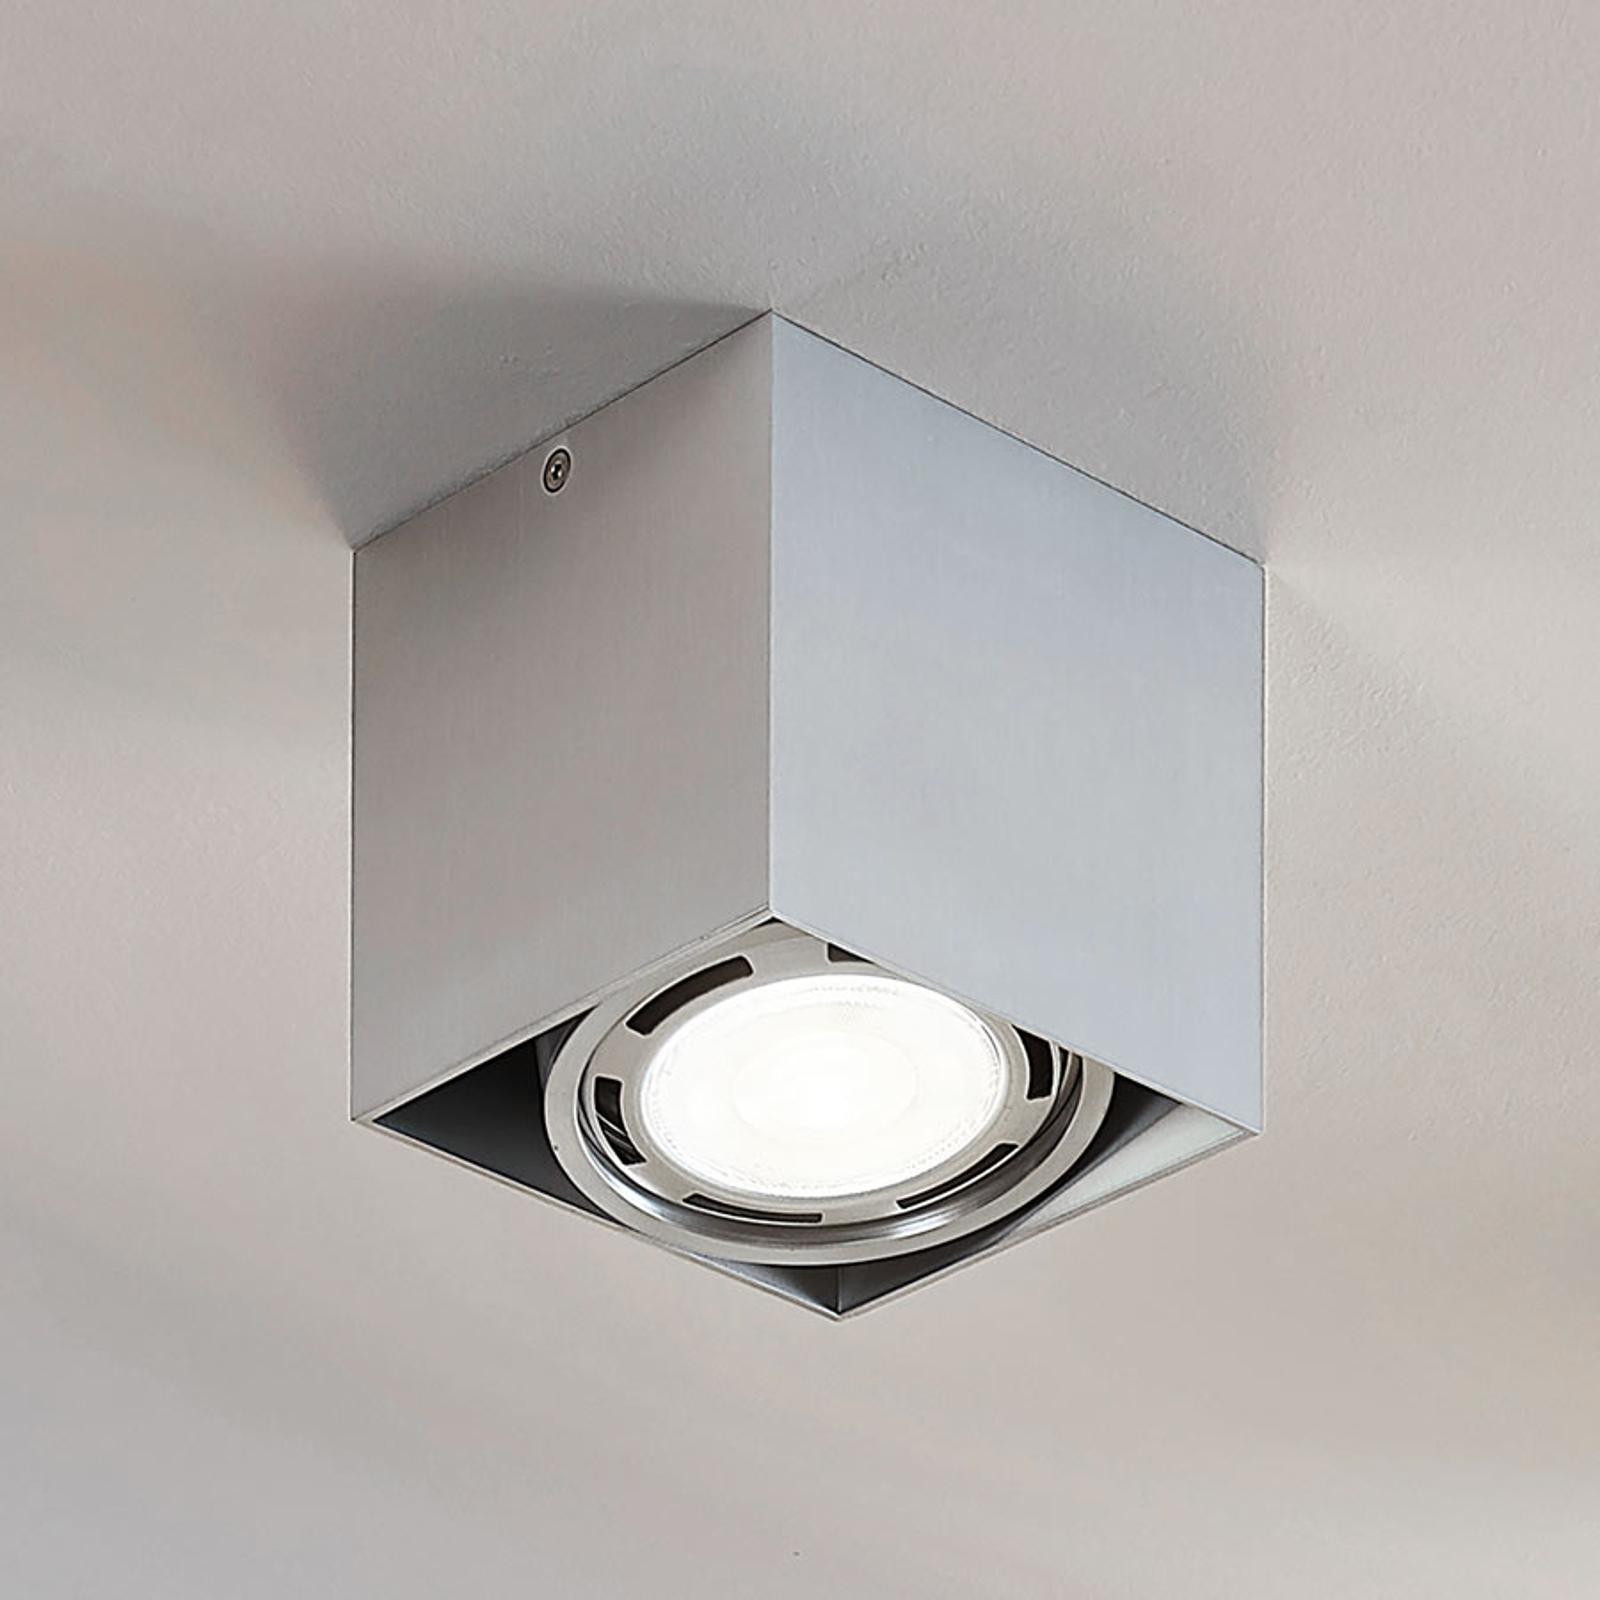 Downlight LED Rosalie à 1 lampe, angulaire, alu